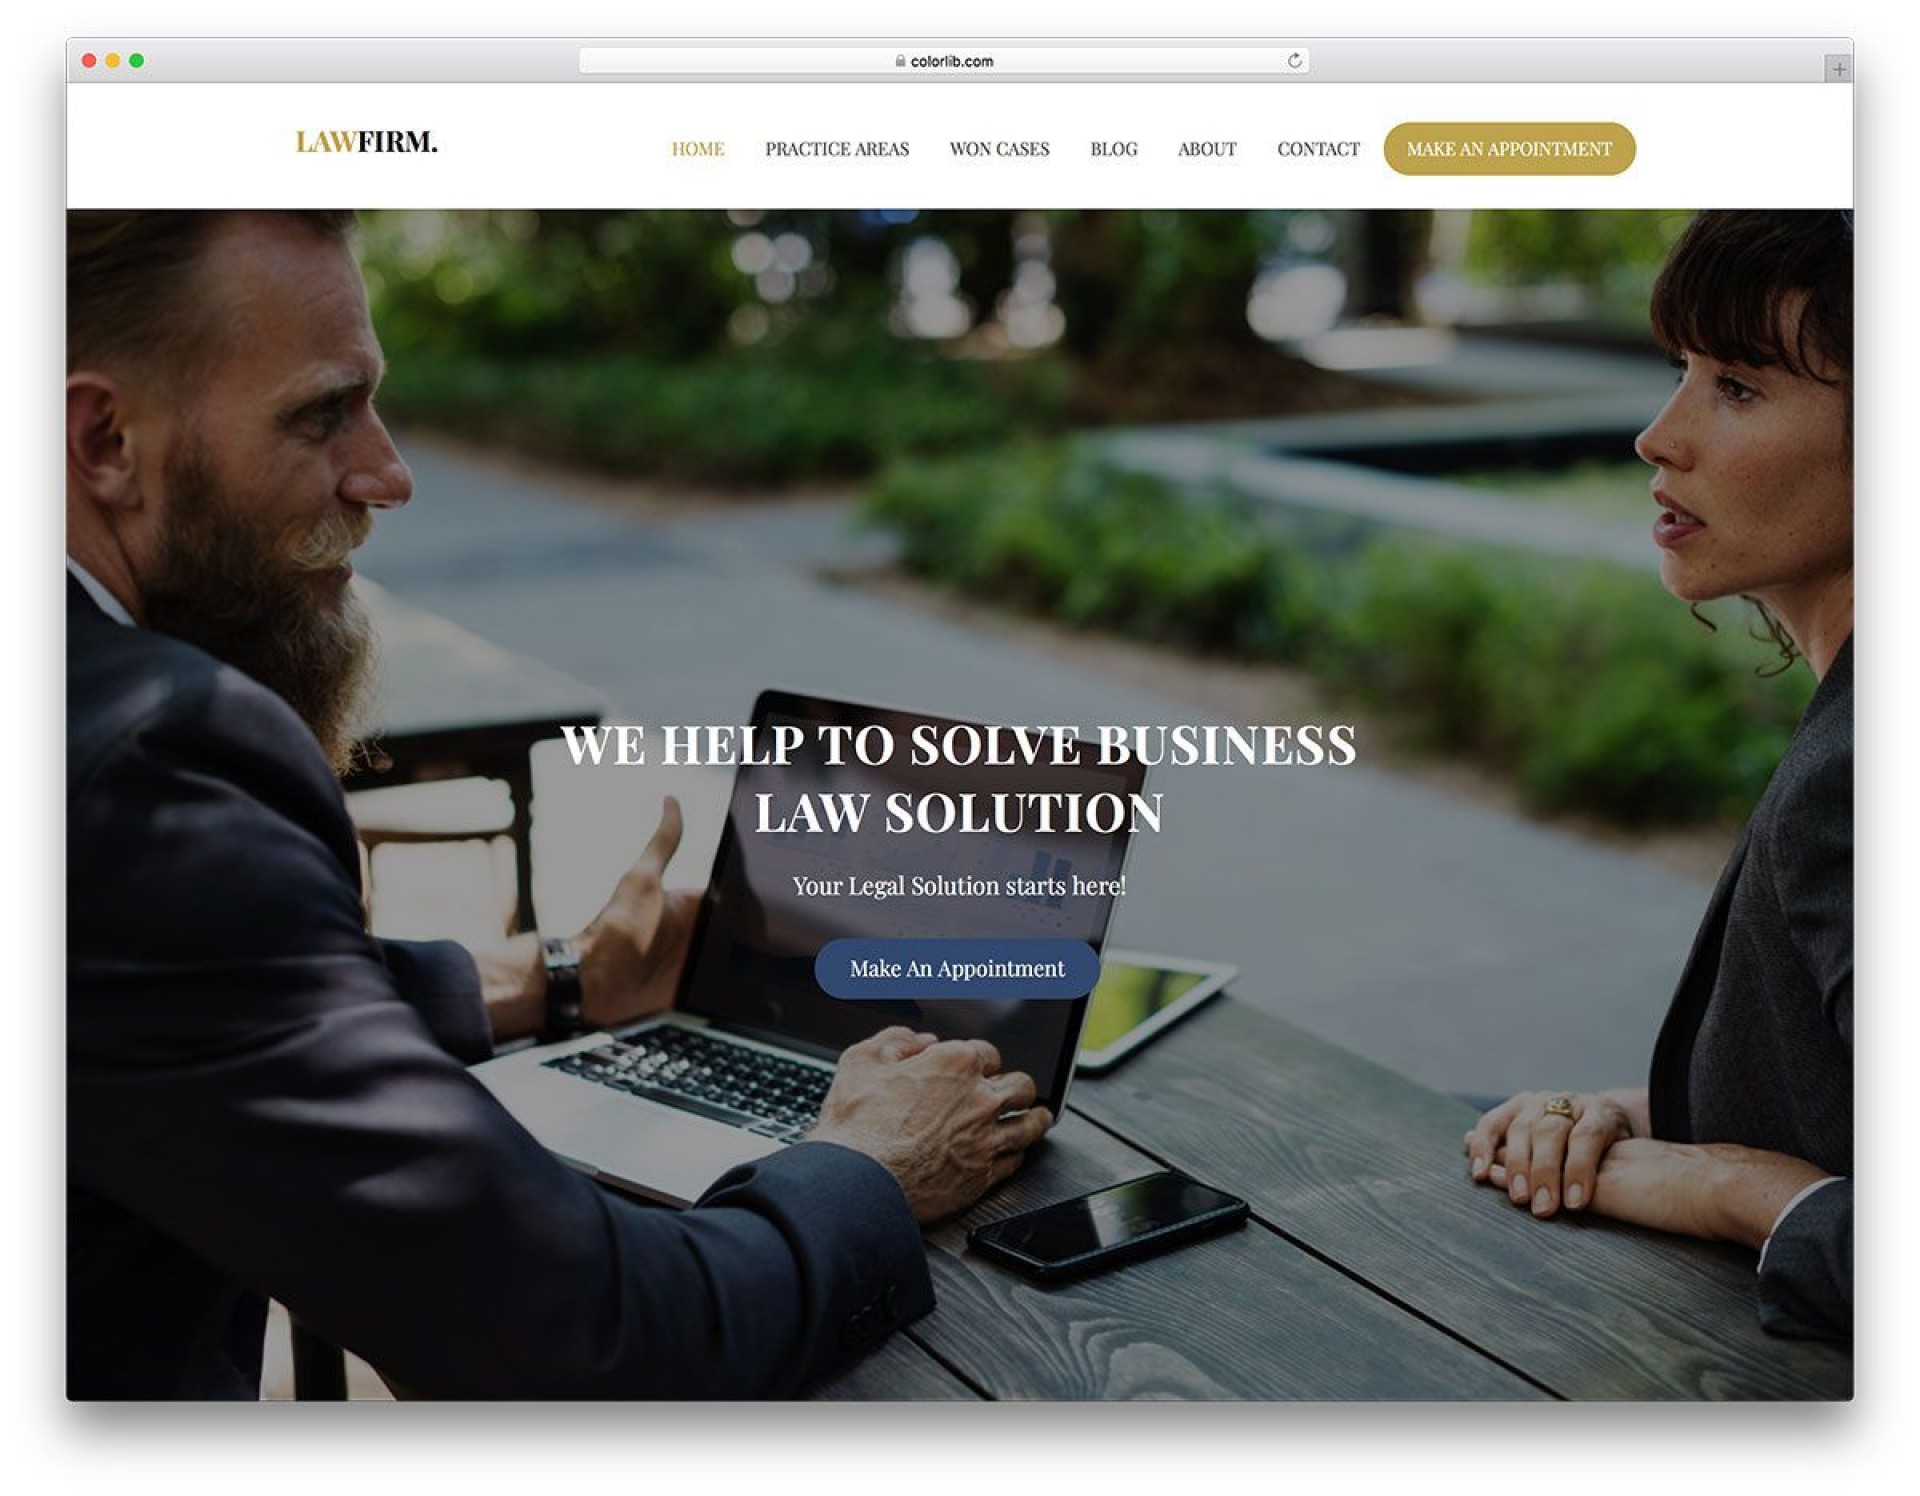 003 Wonderful Law Firm Website Template Free High Def  Wordpres1920